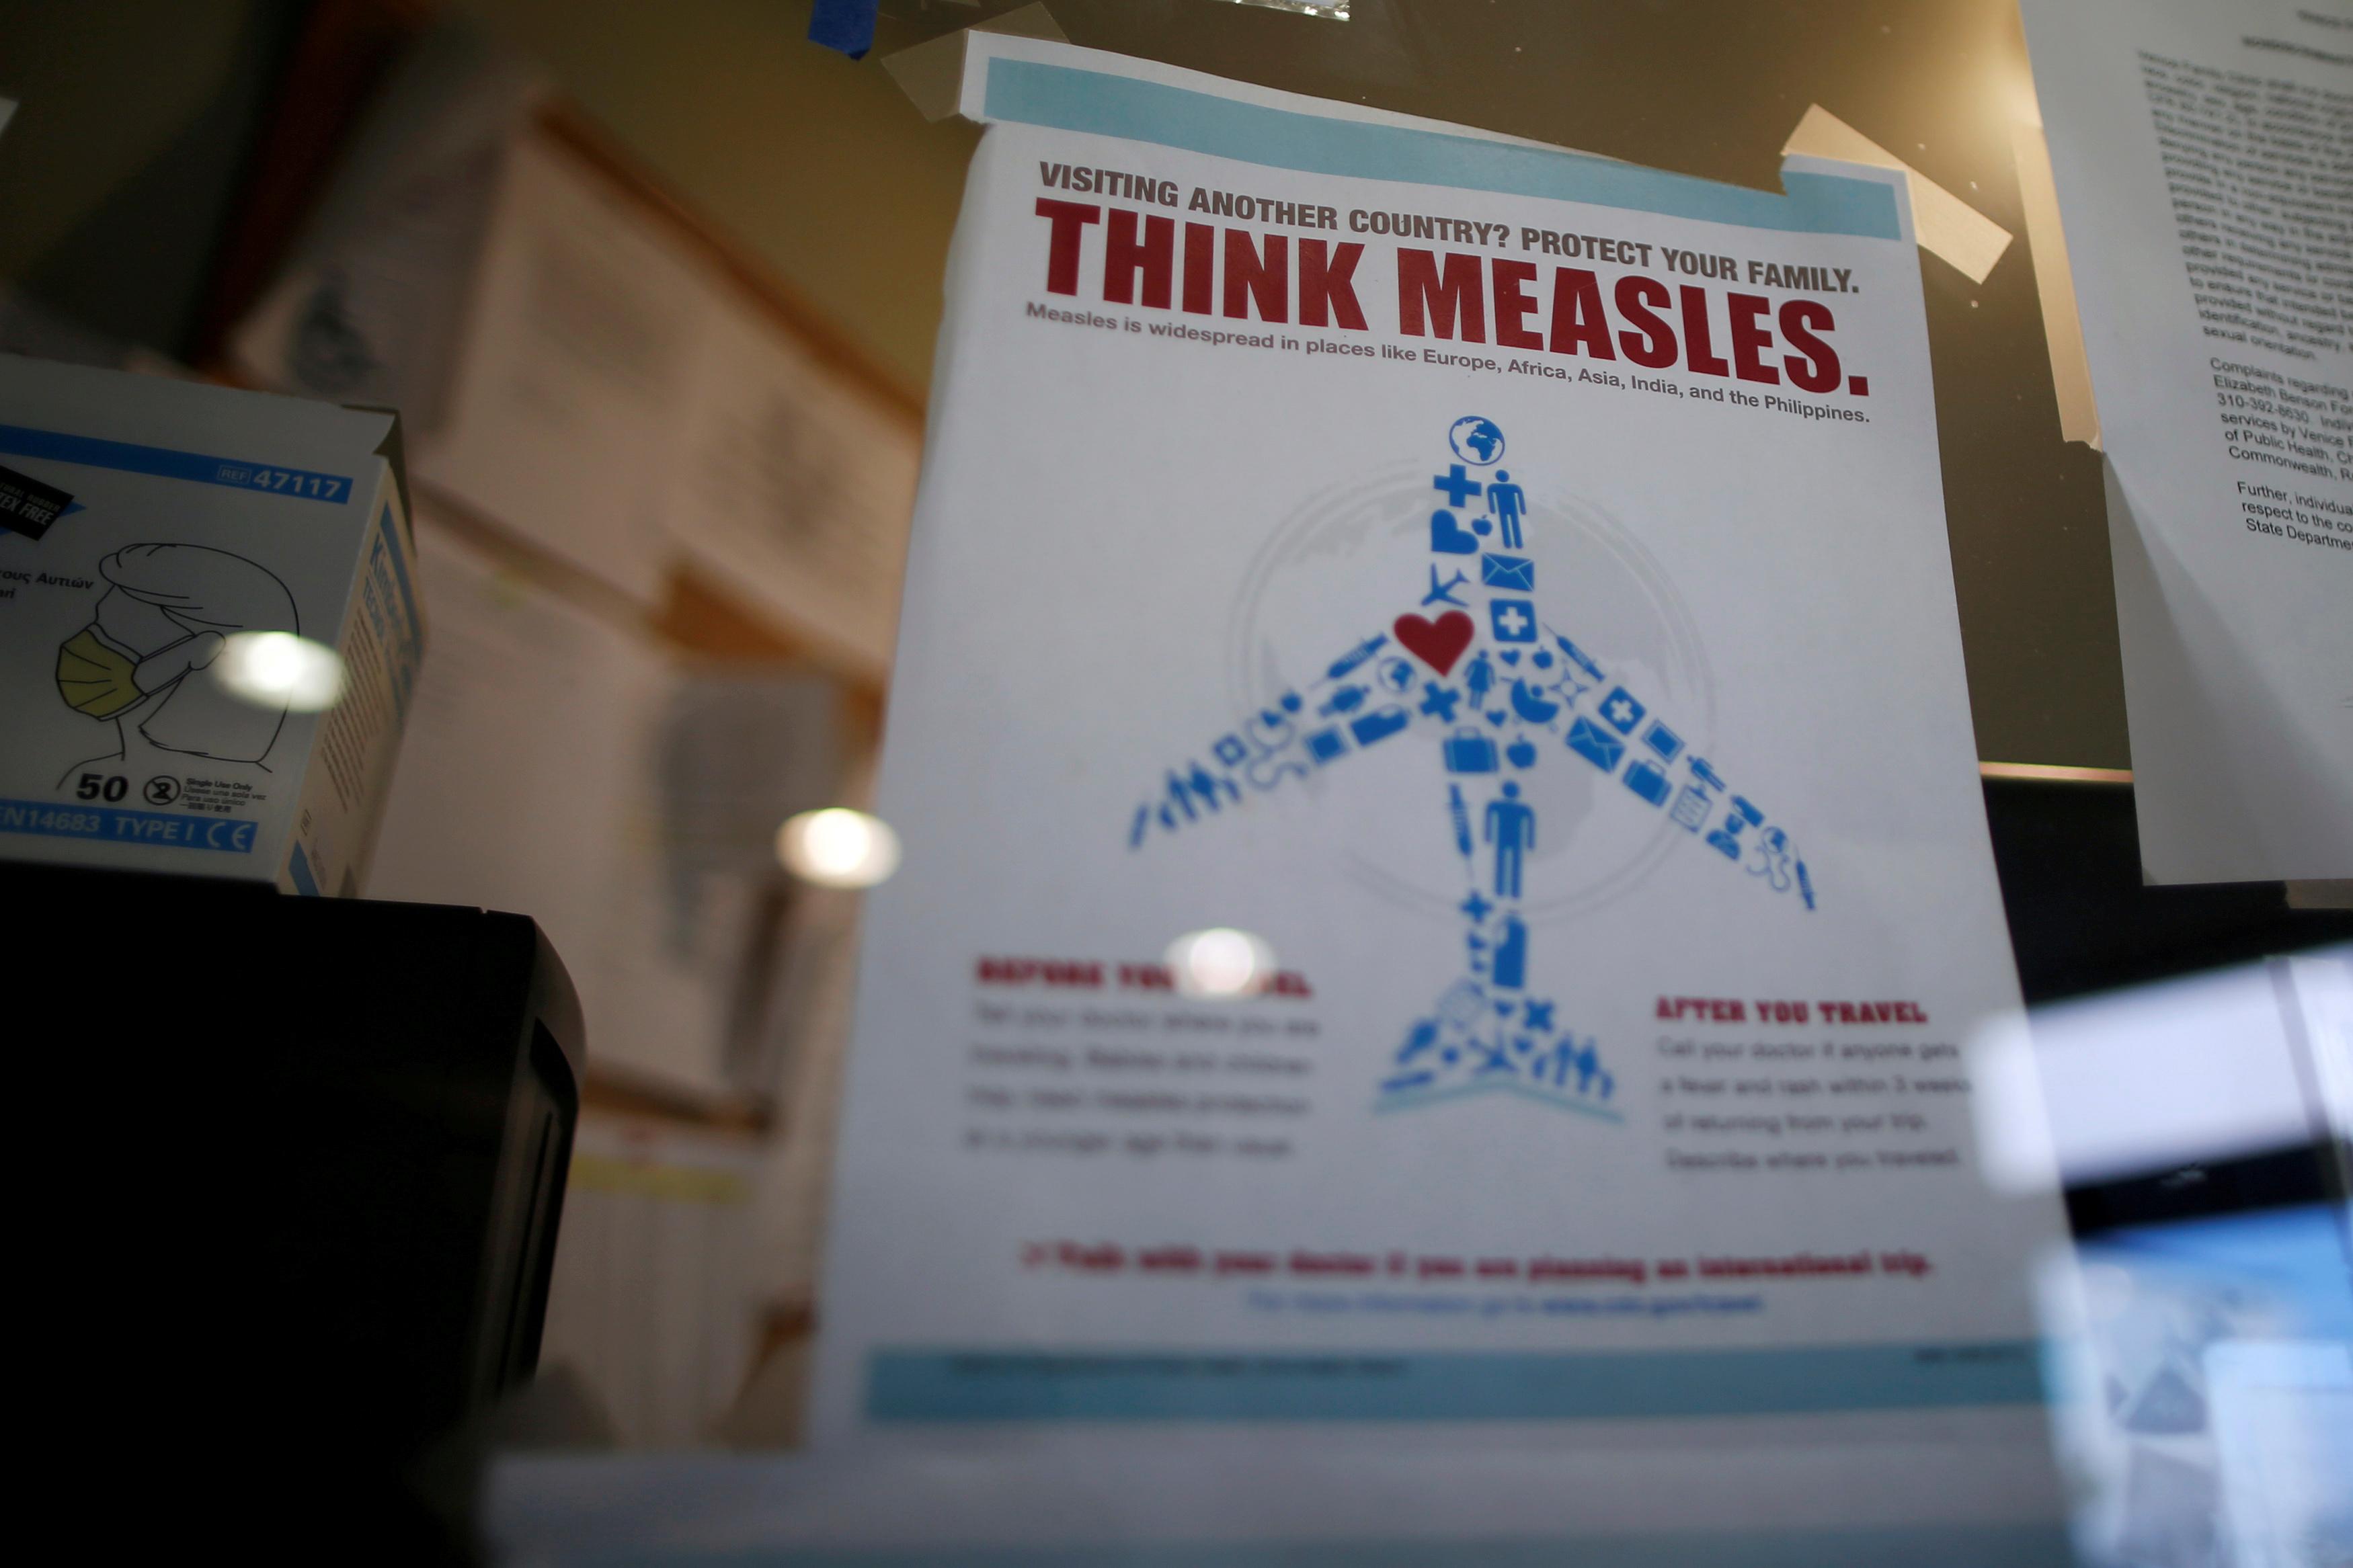 'Alarming upsurge' in measles has devastating impact, WHO warns